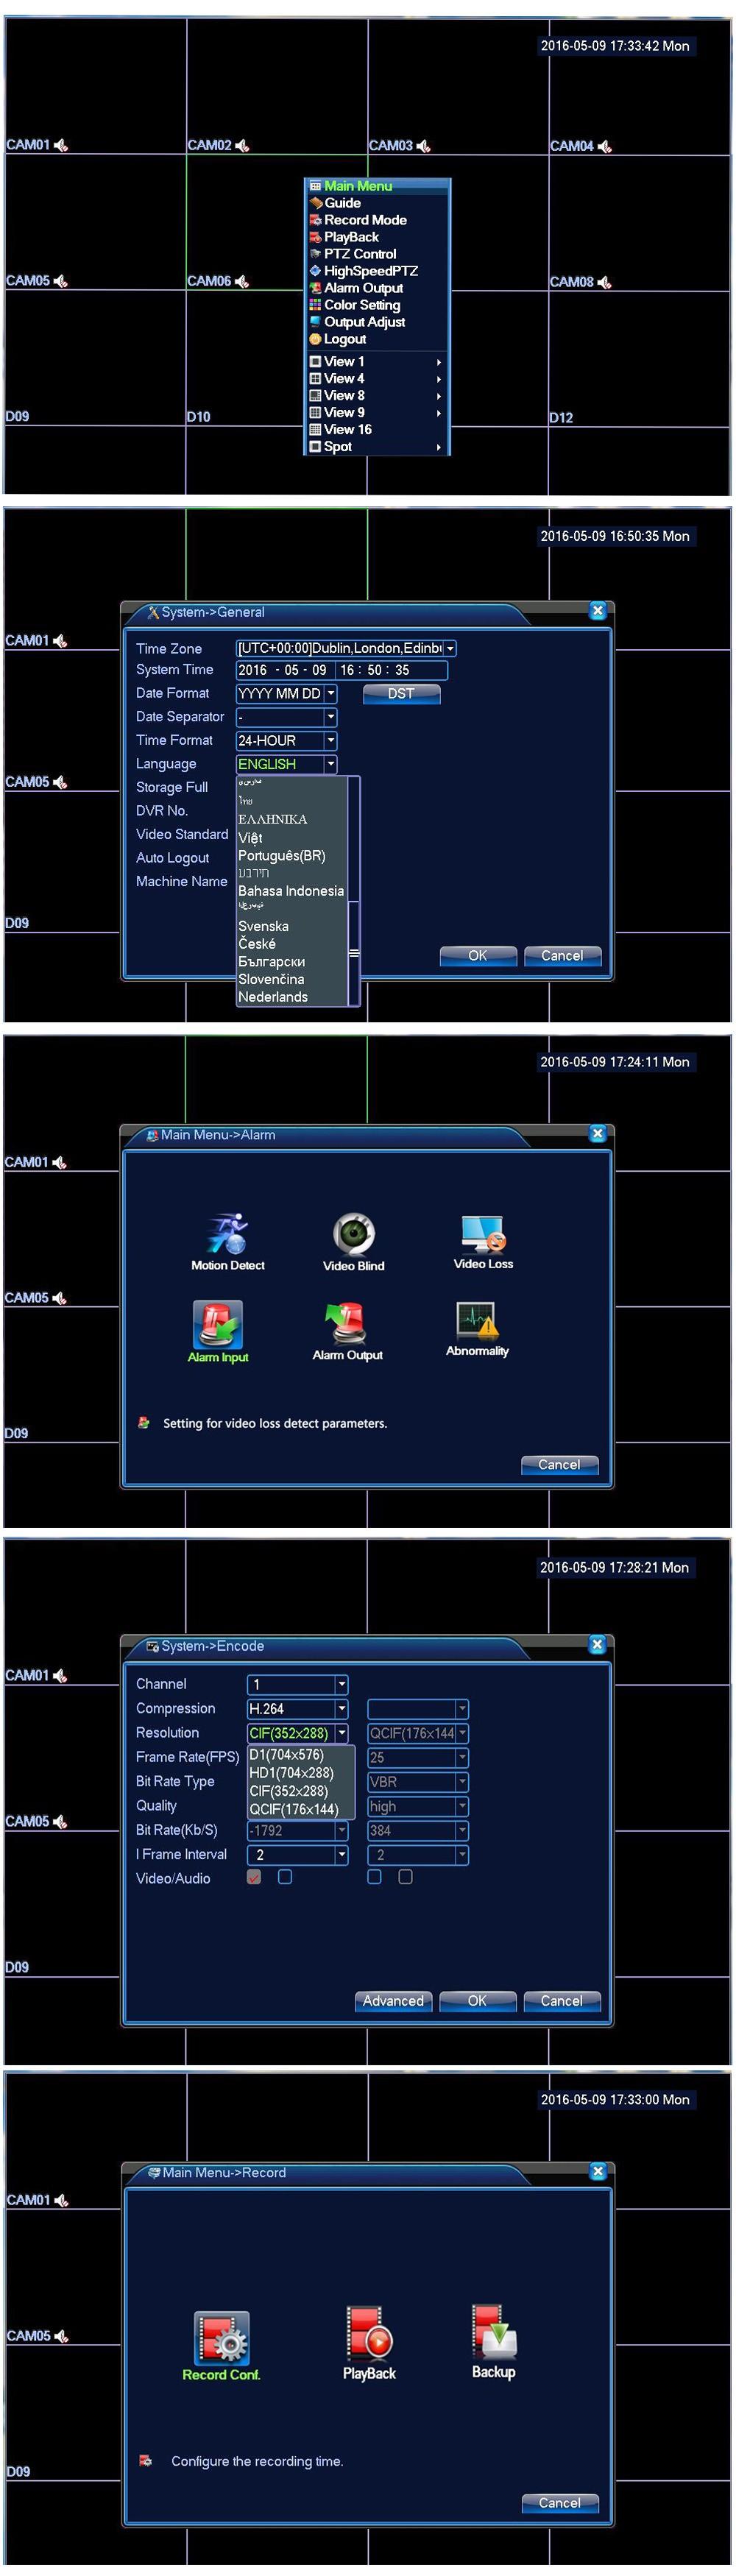 UI monitor